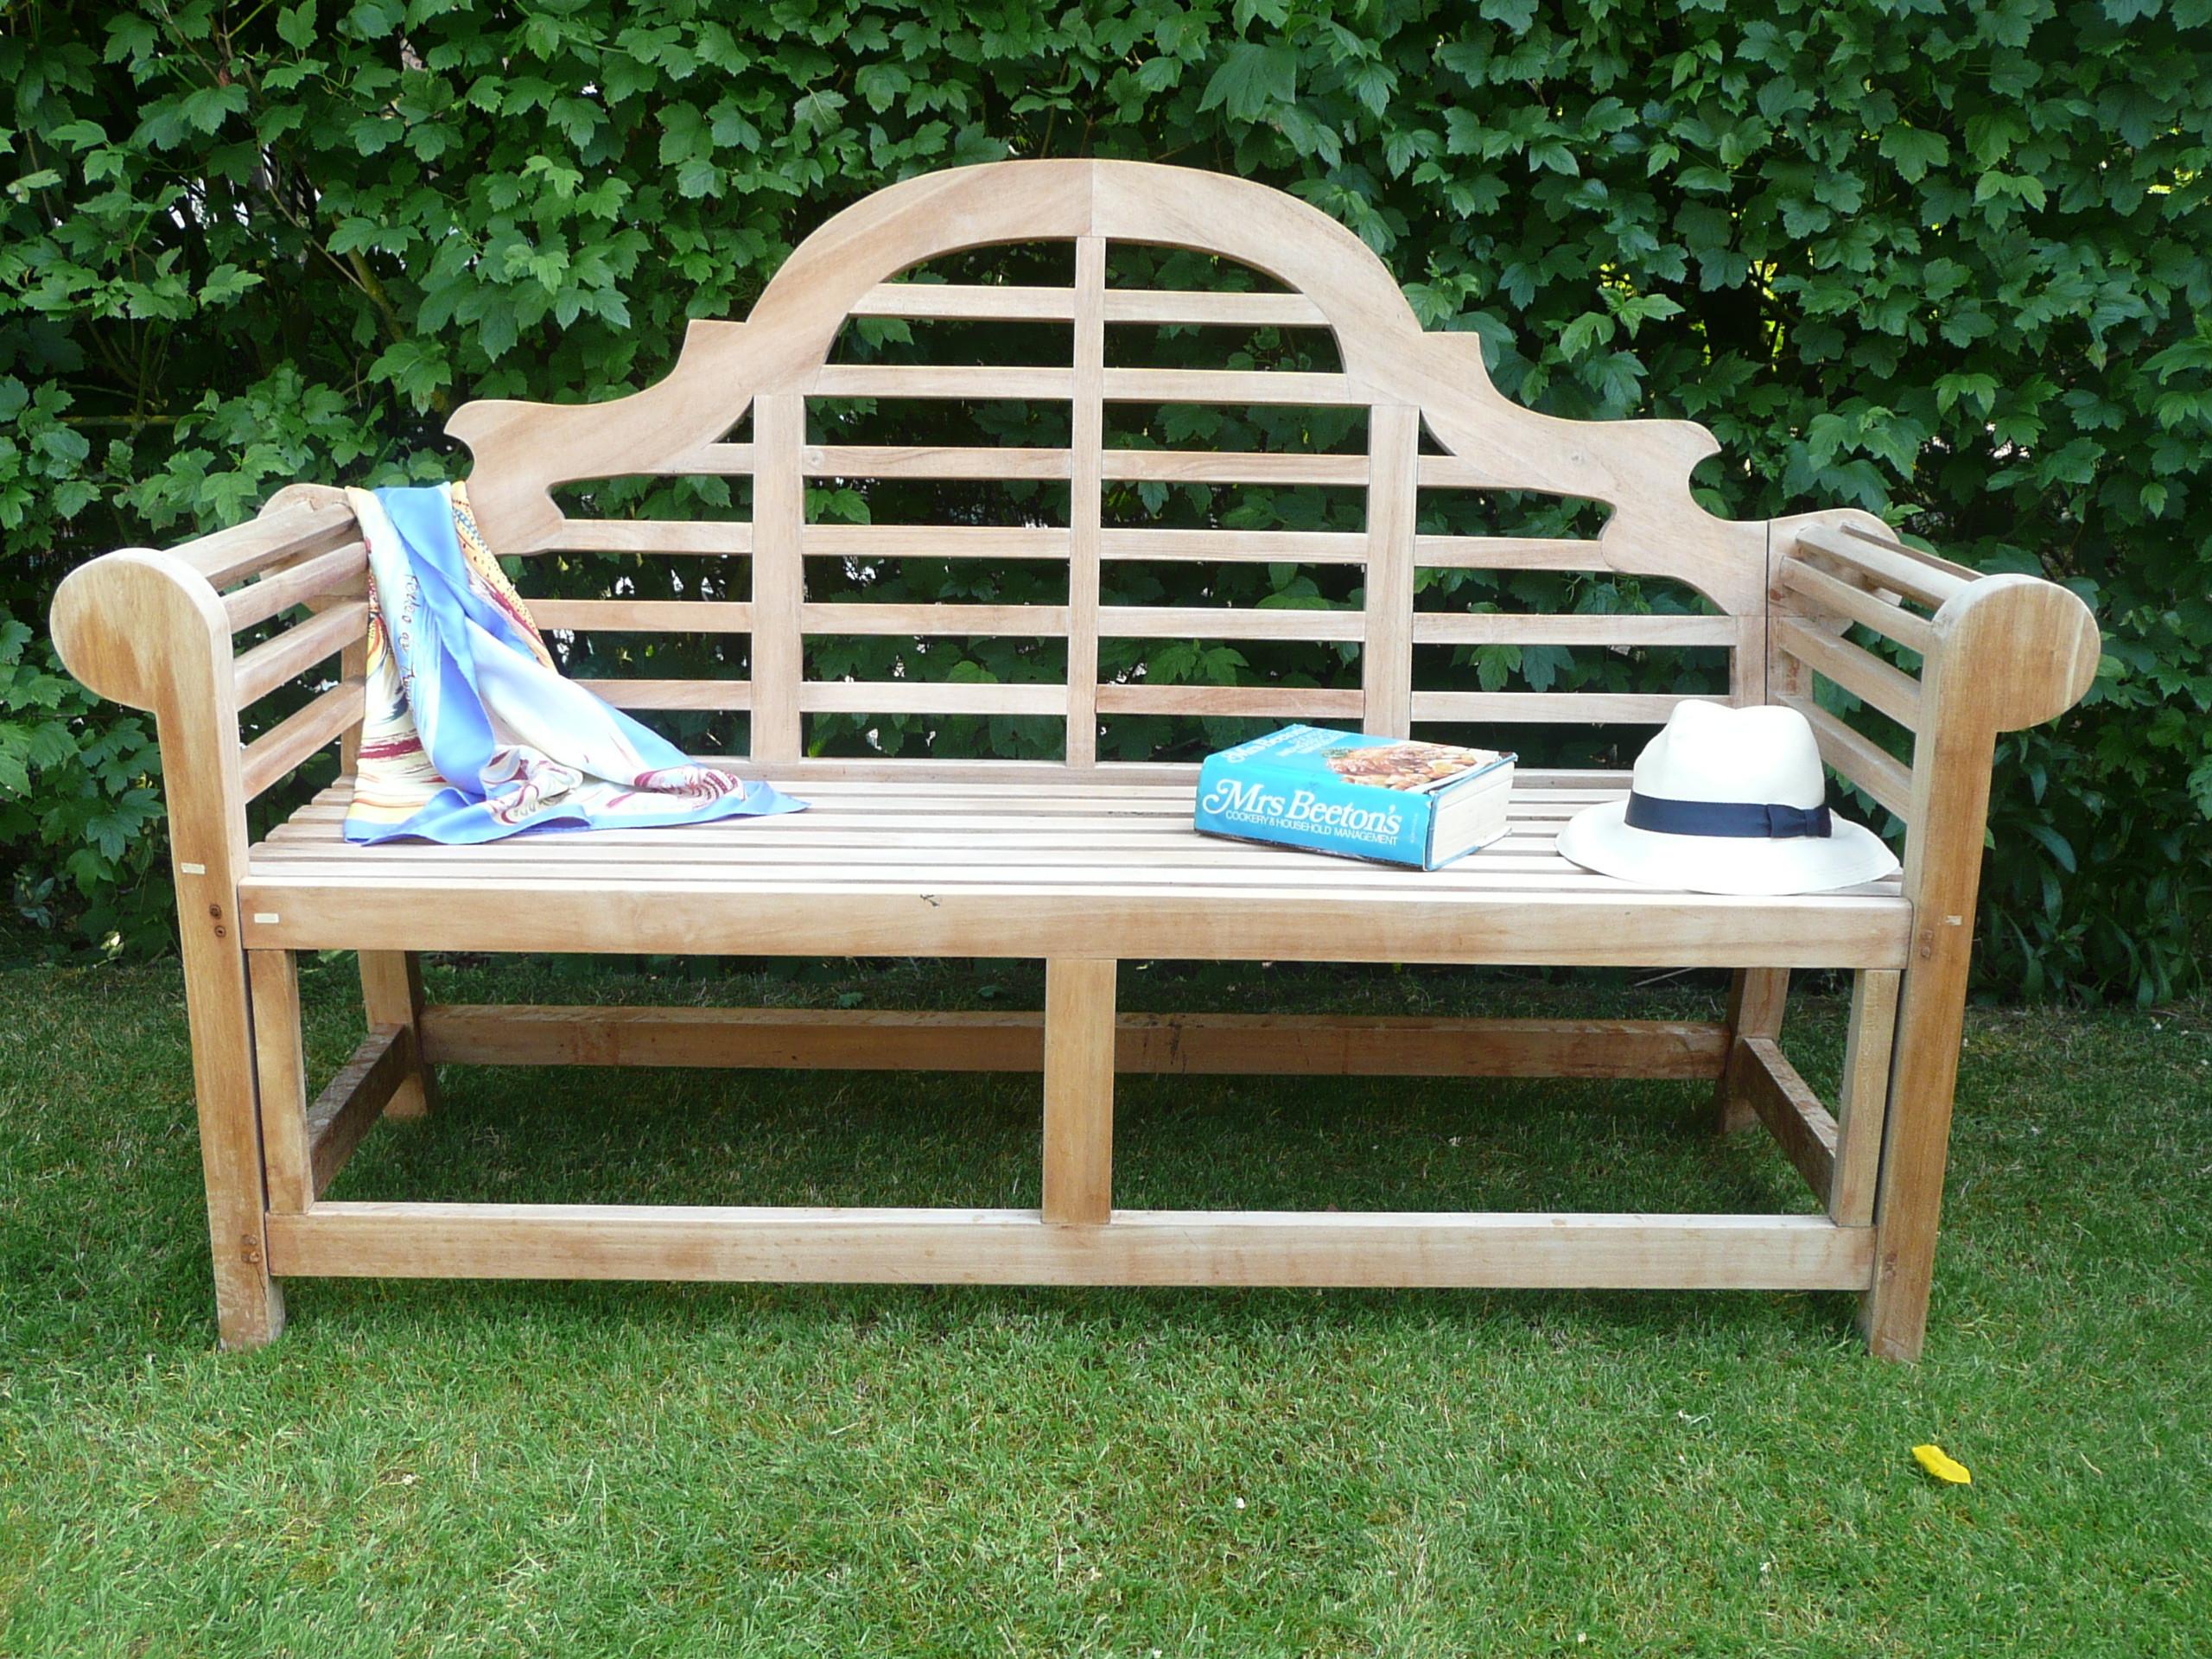 Humber Imports Garden Lutyens Bench Classic 4 Seater Geade A Teak Wood New Ebay